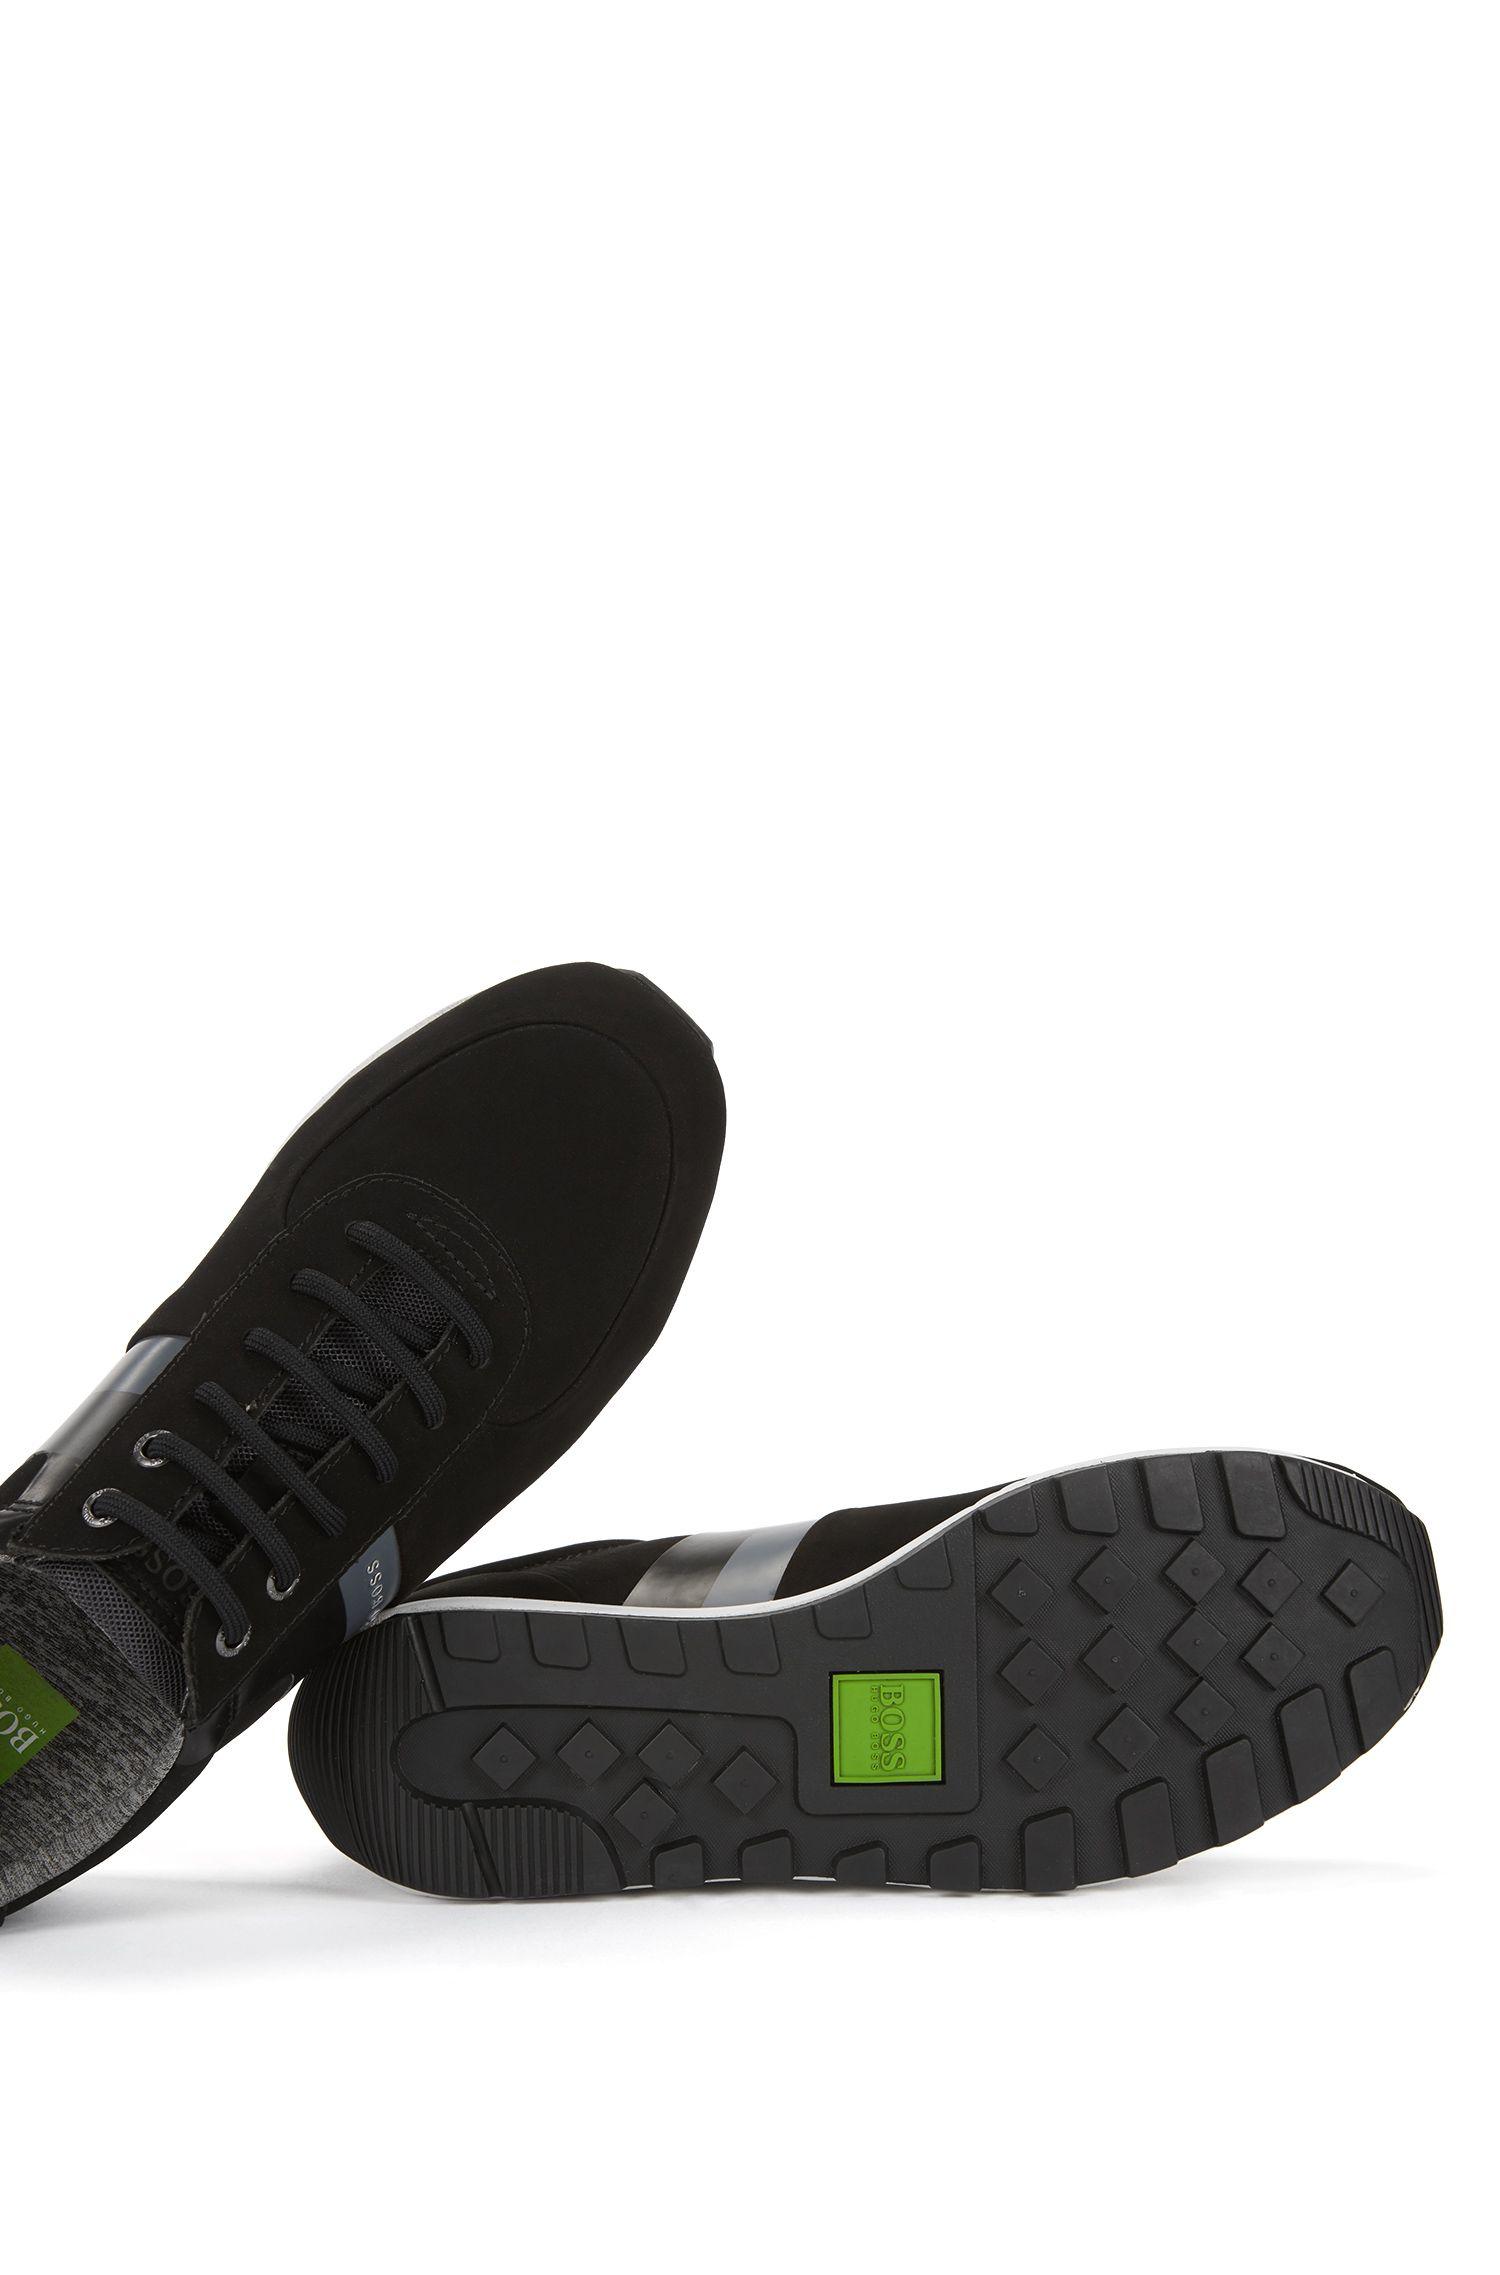 Leather Sneaker | Blast Runn Nust